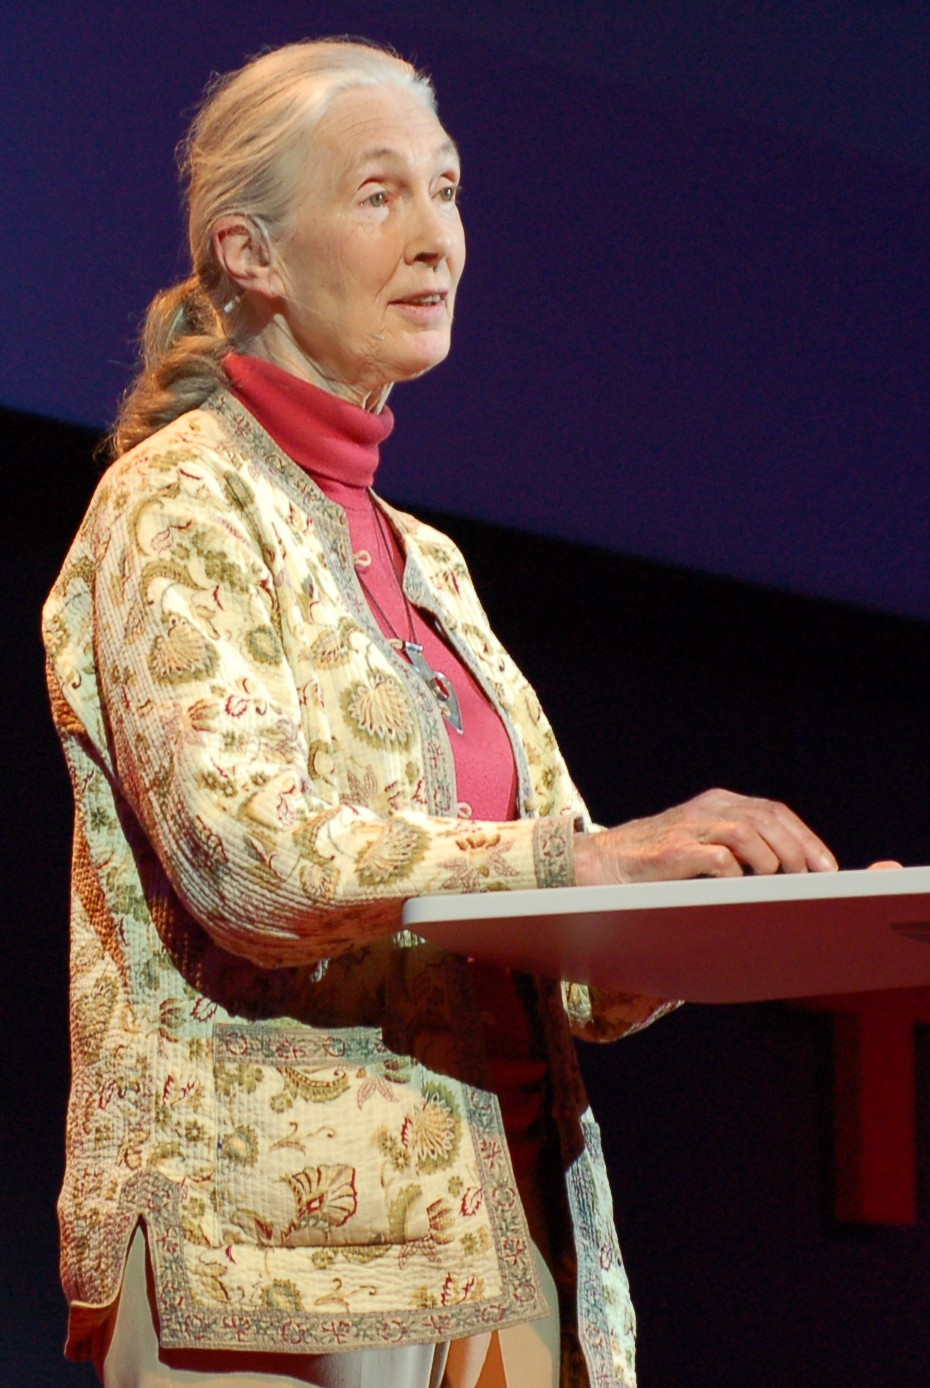 Jane Speaking.jpg